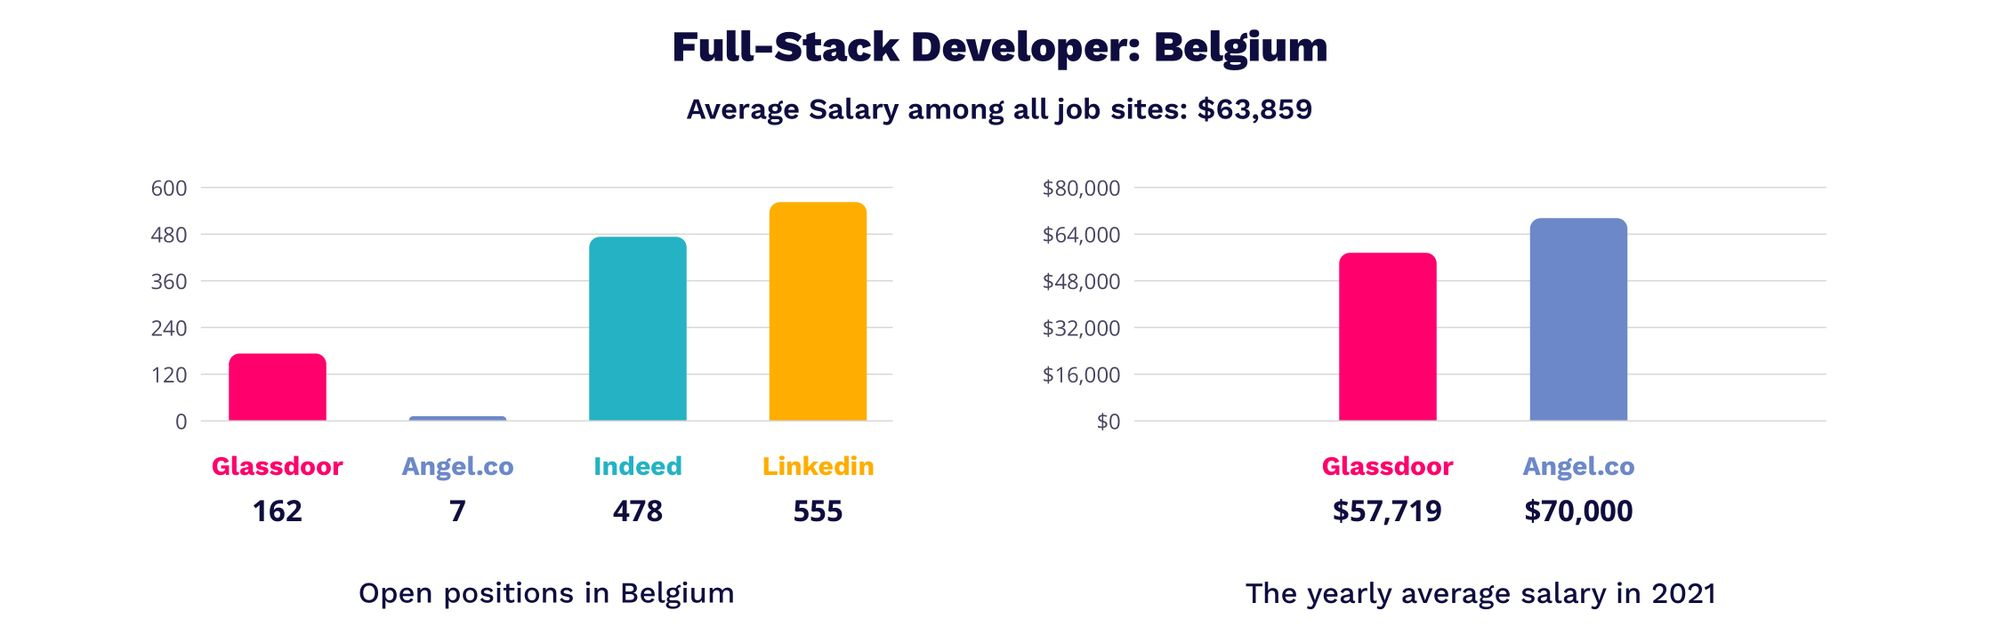 full-stack developer salary in Belgium